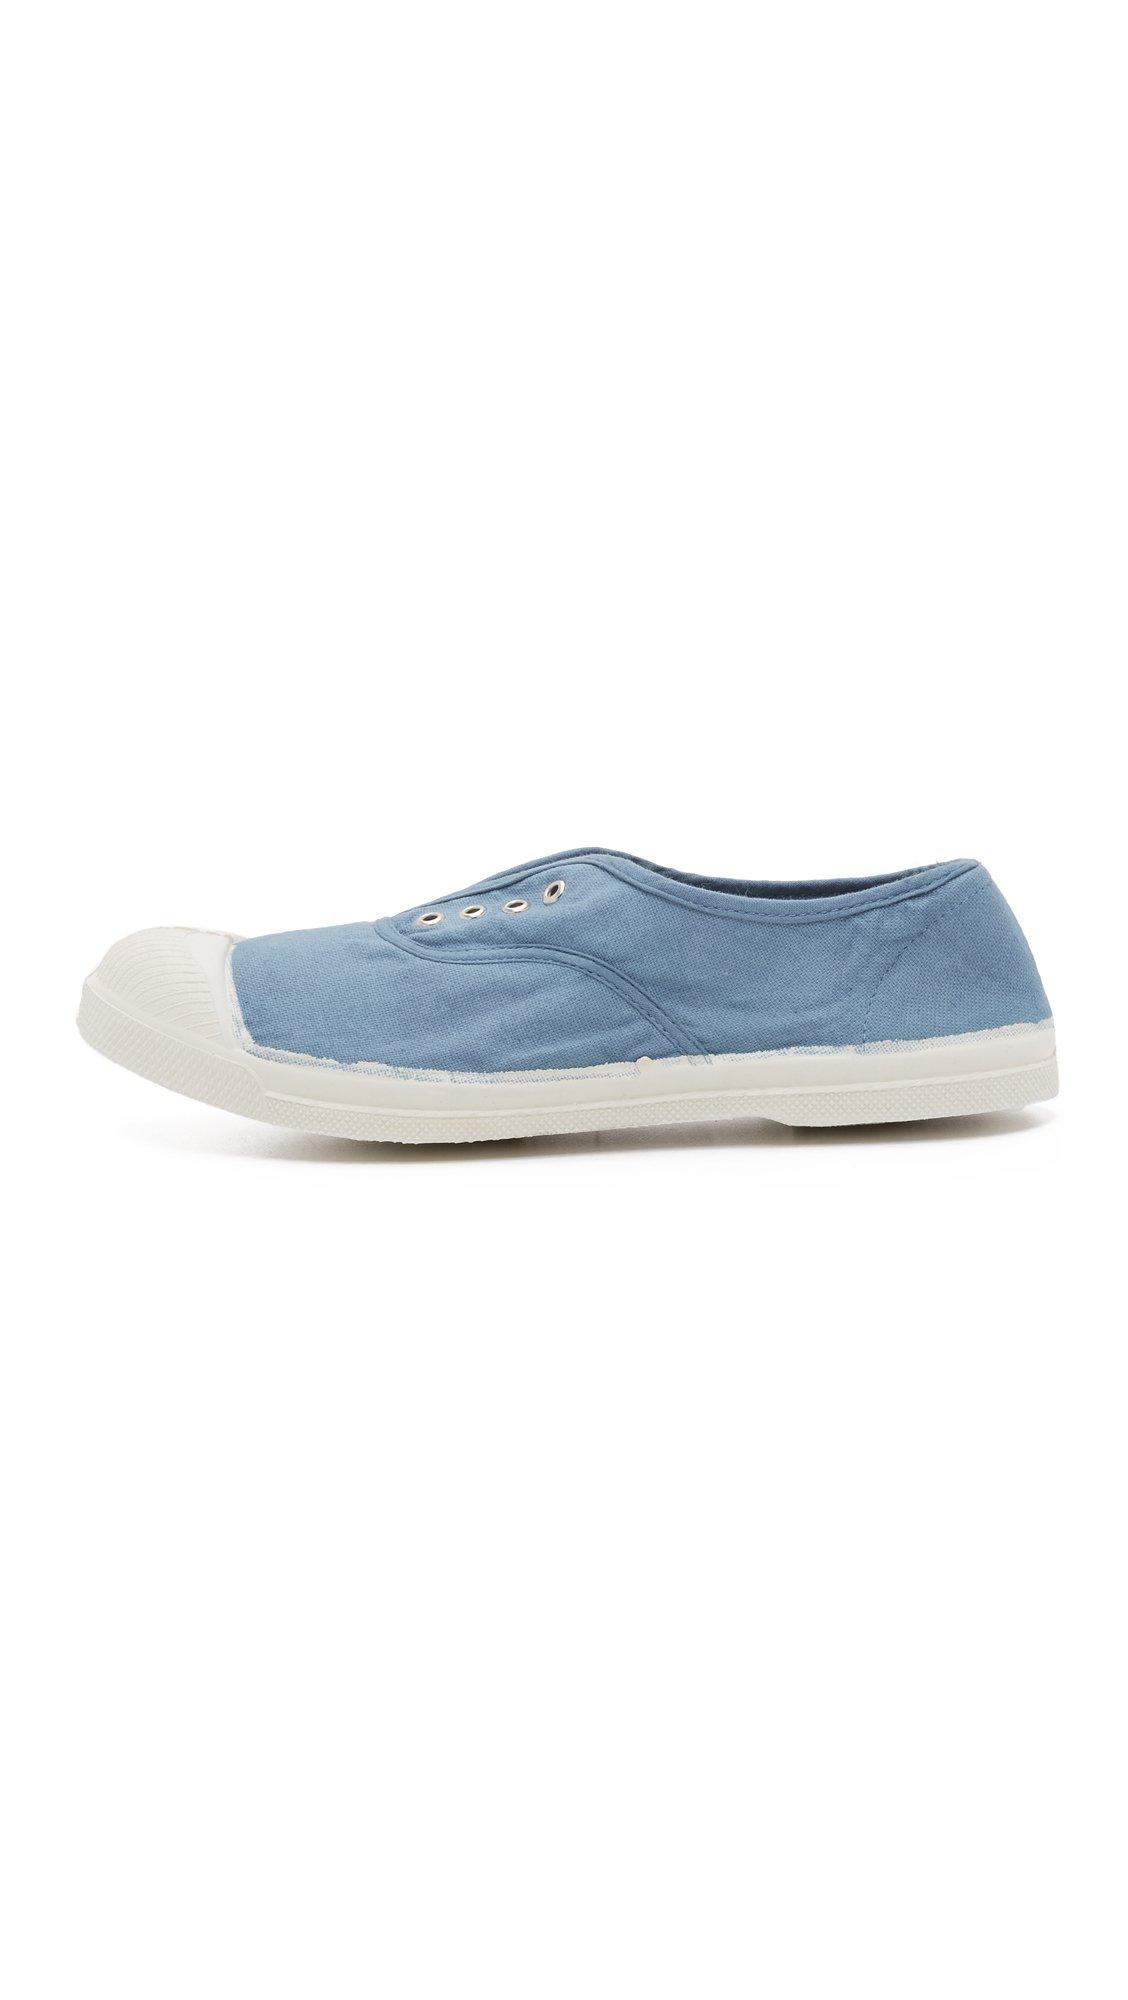 Bensimon Women S Shoes Size